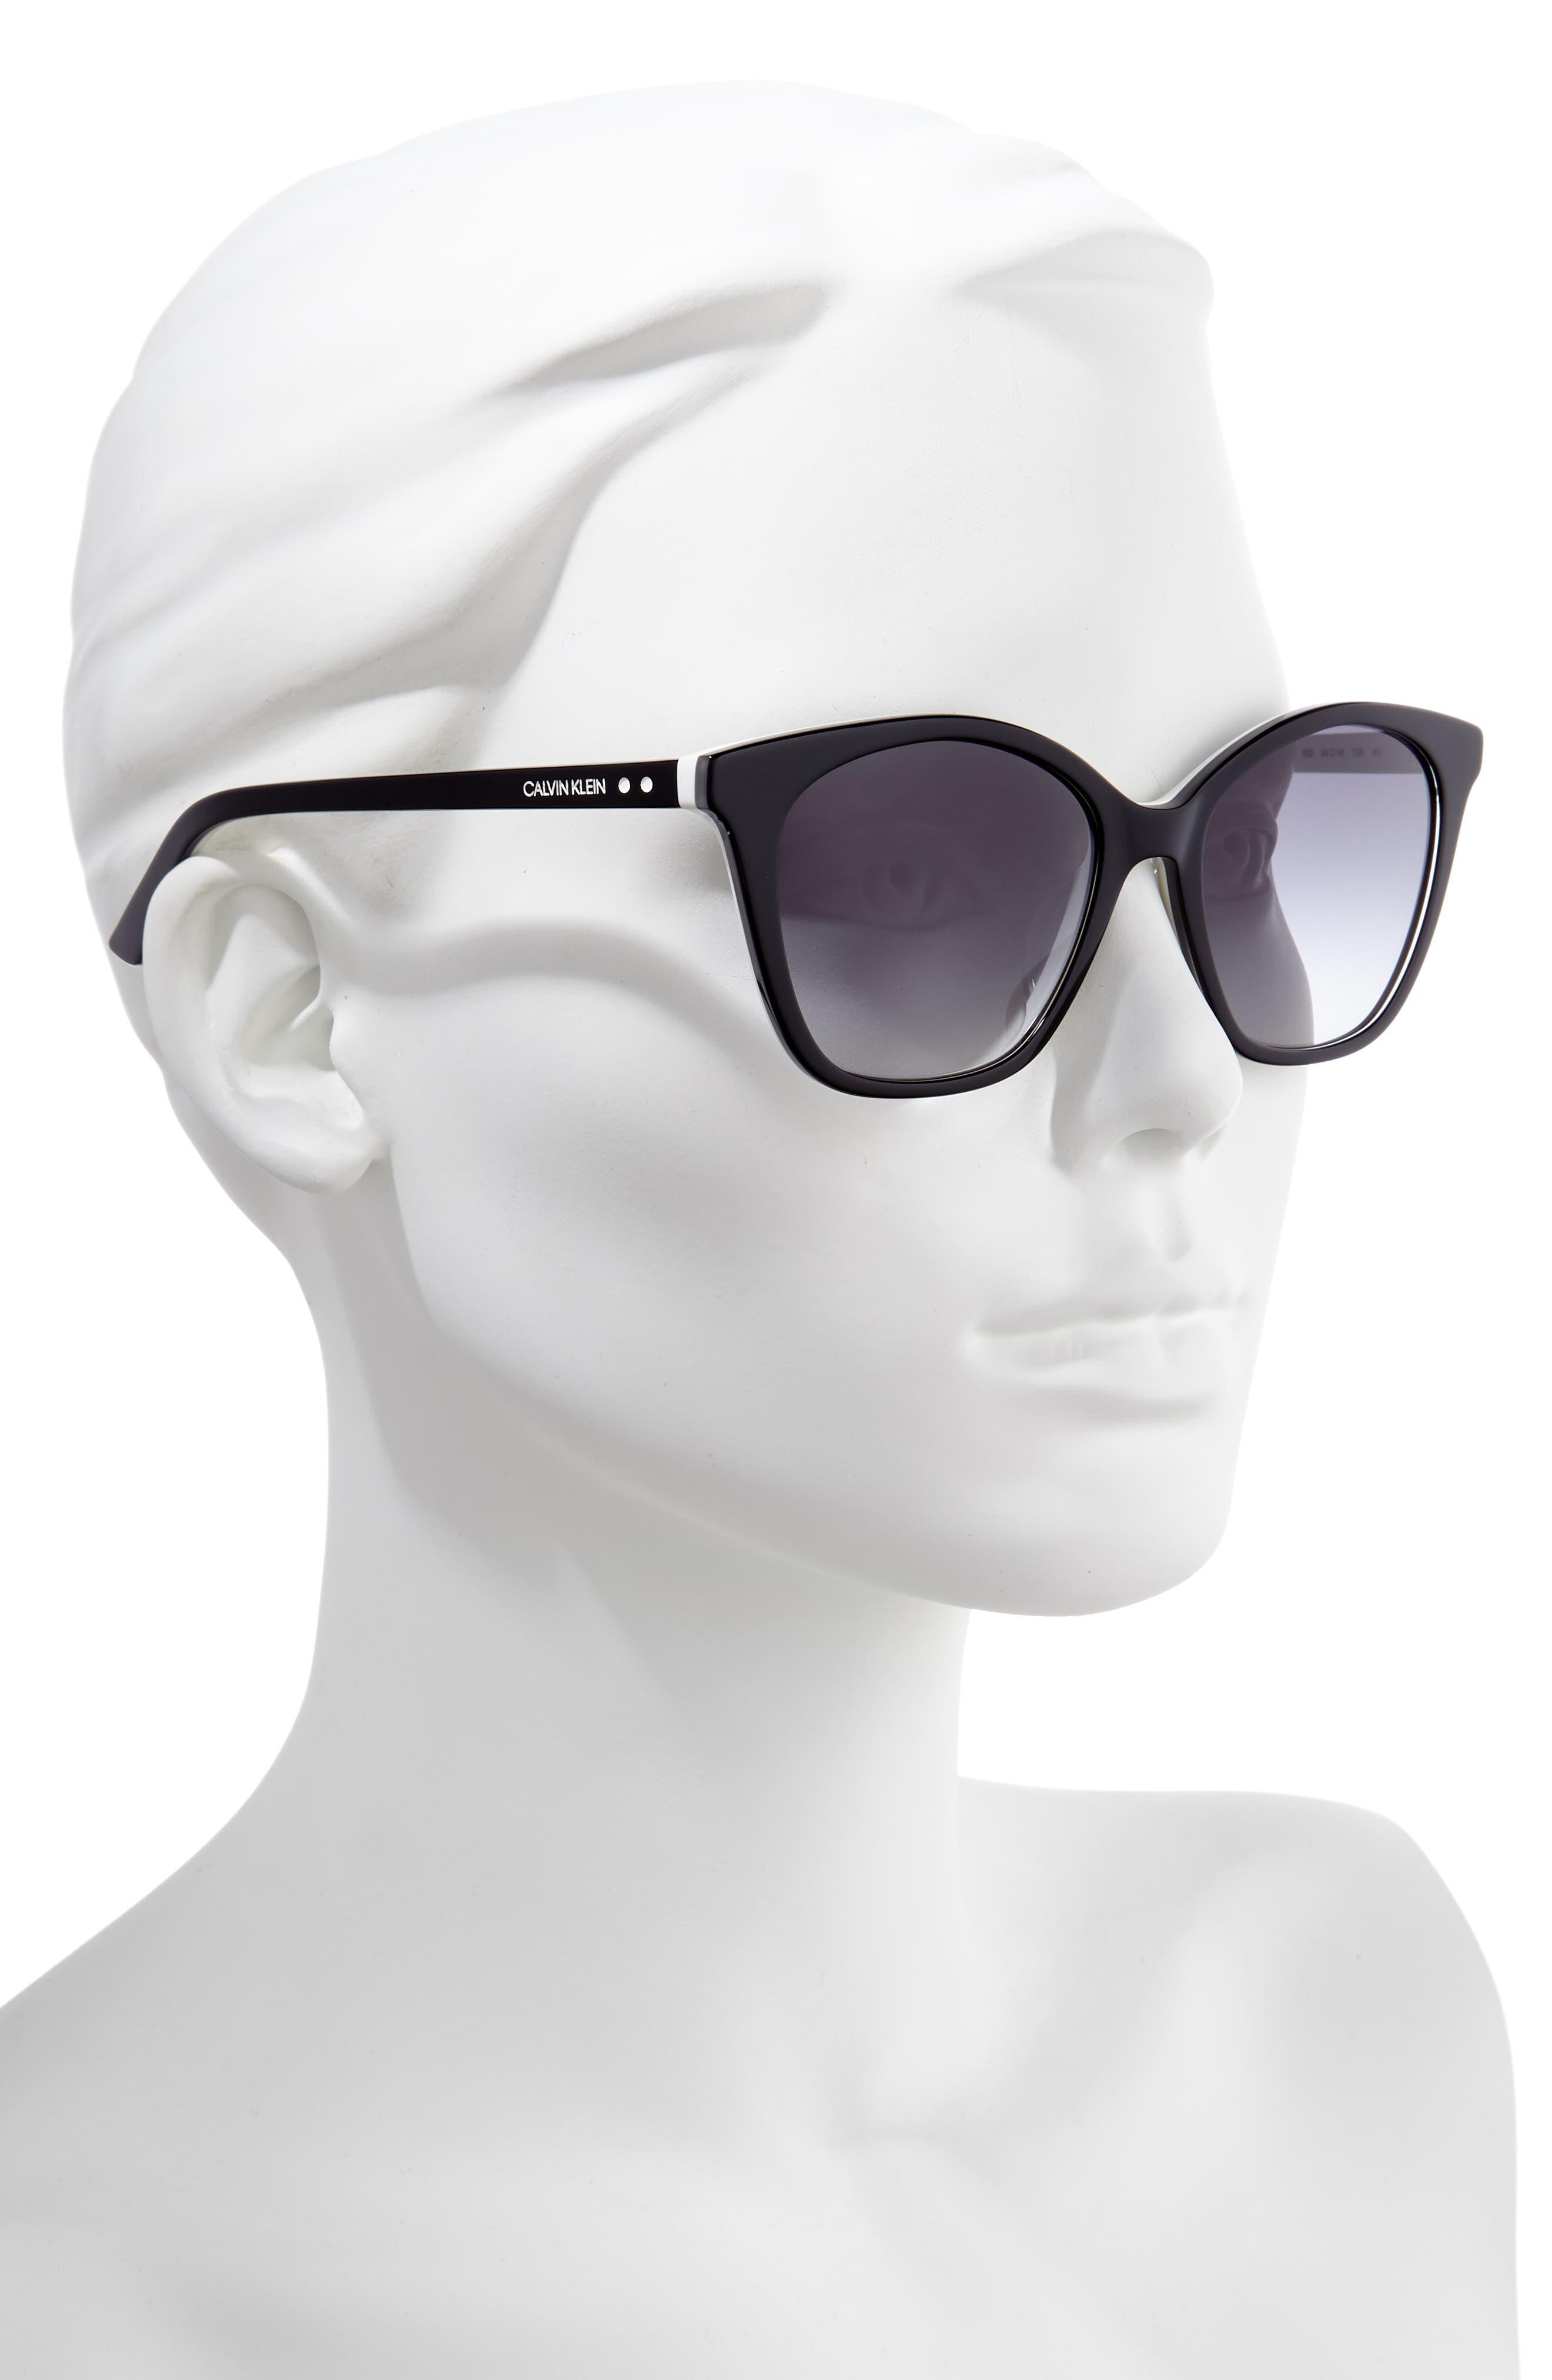 e14a5a6a6d Calvin Klein Sunglasses for Women